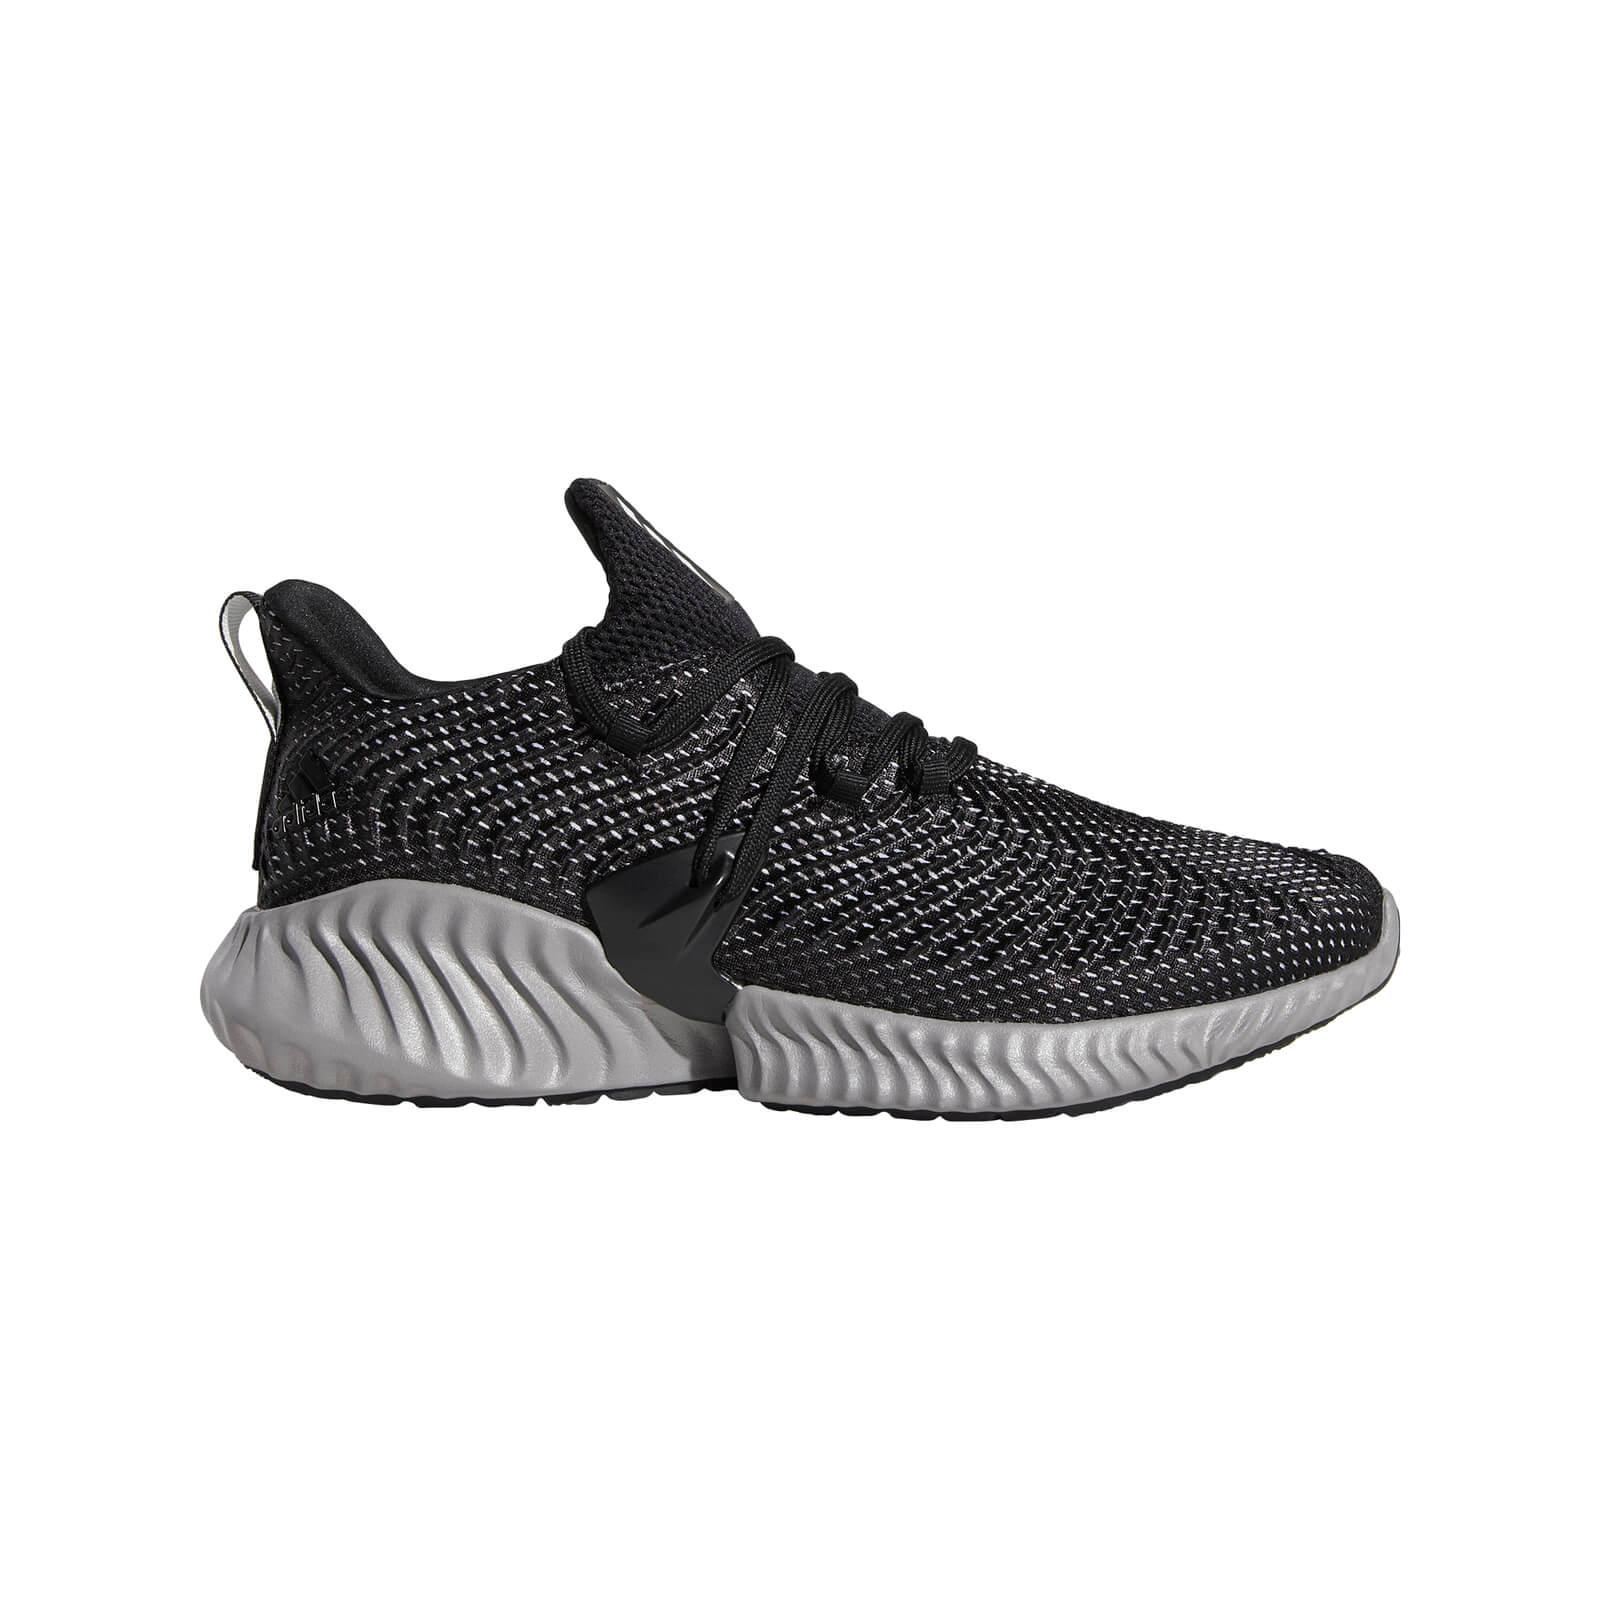 adidas Men's Alphabounce Instinct Running Shoes - Black - US 7.5/UK 7 - Black